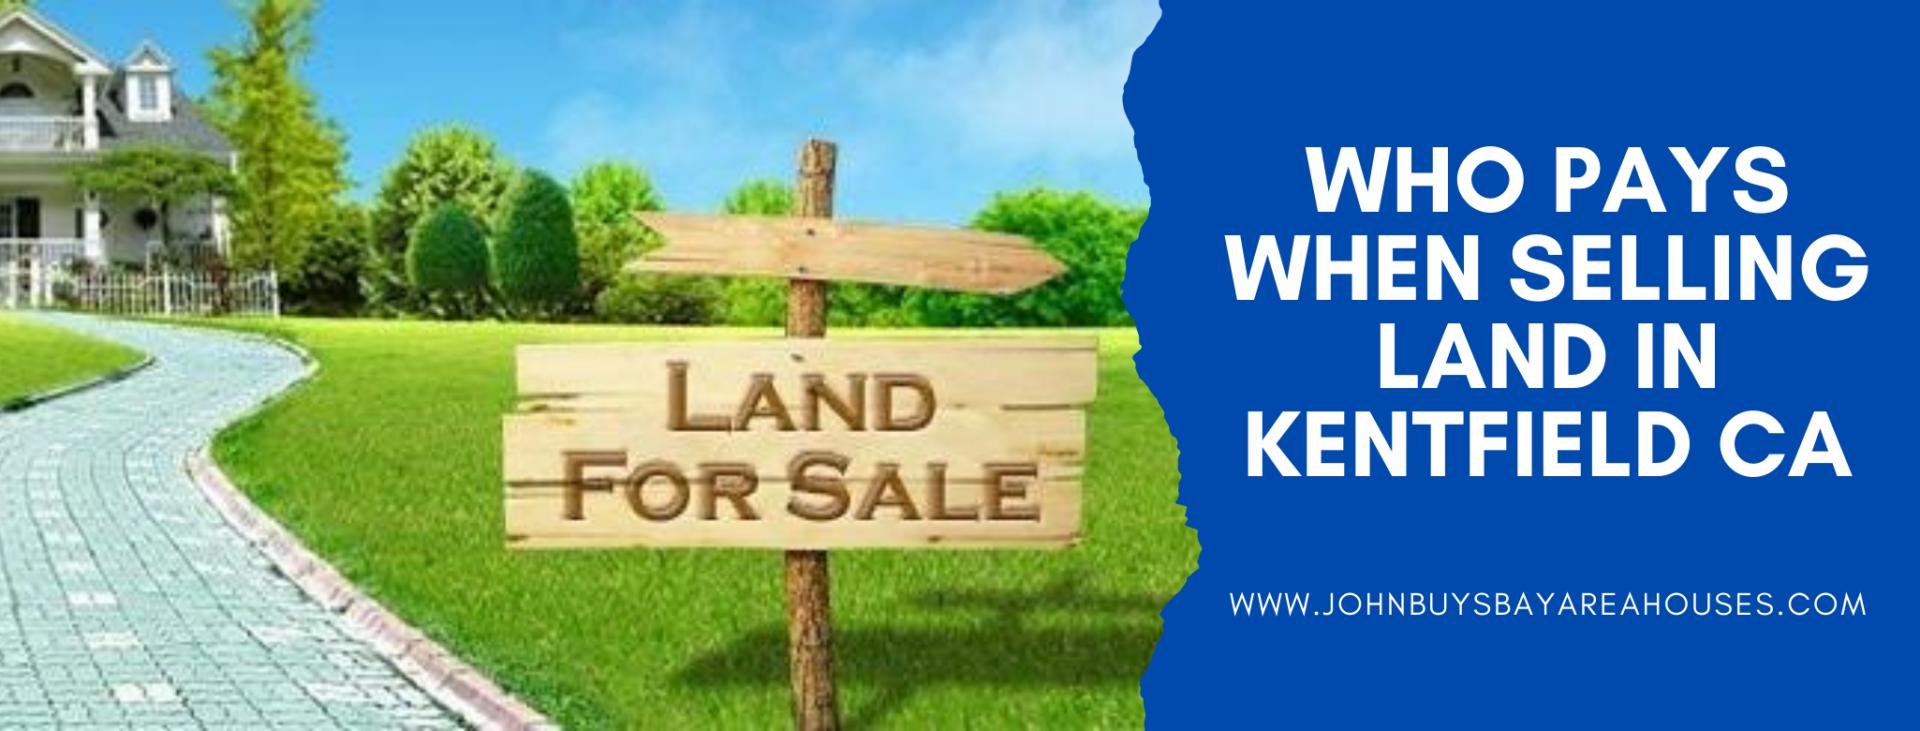 We buy properties in Kentfield CA